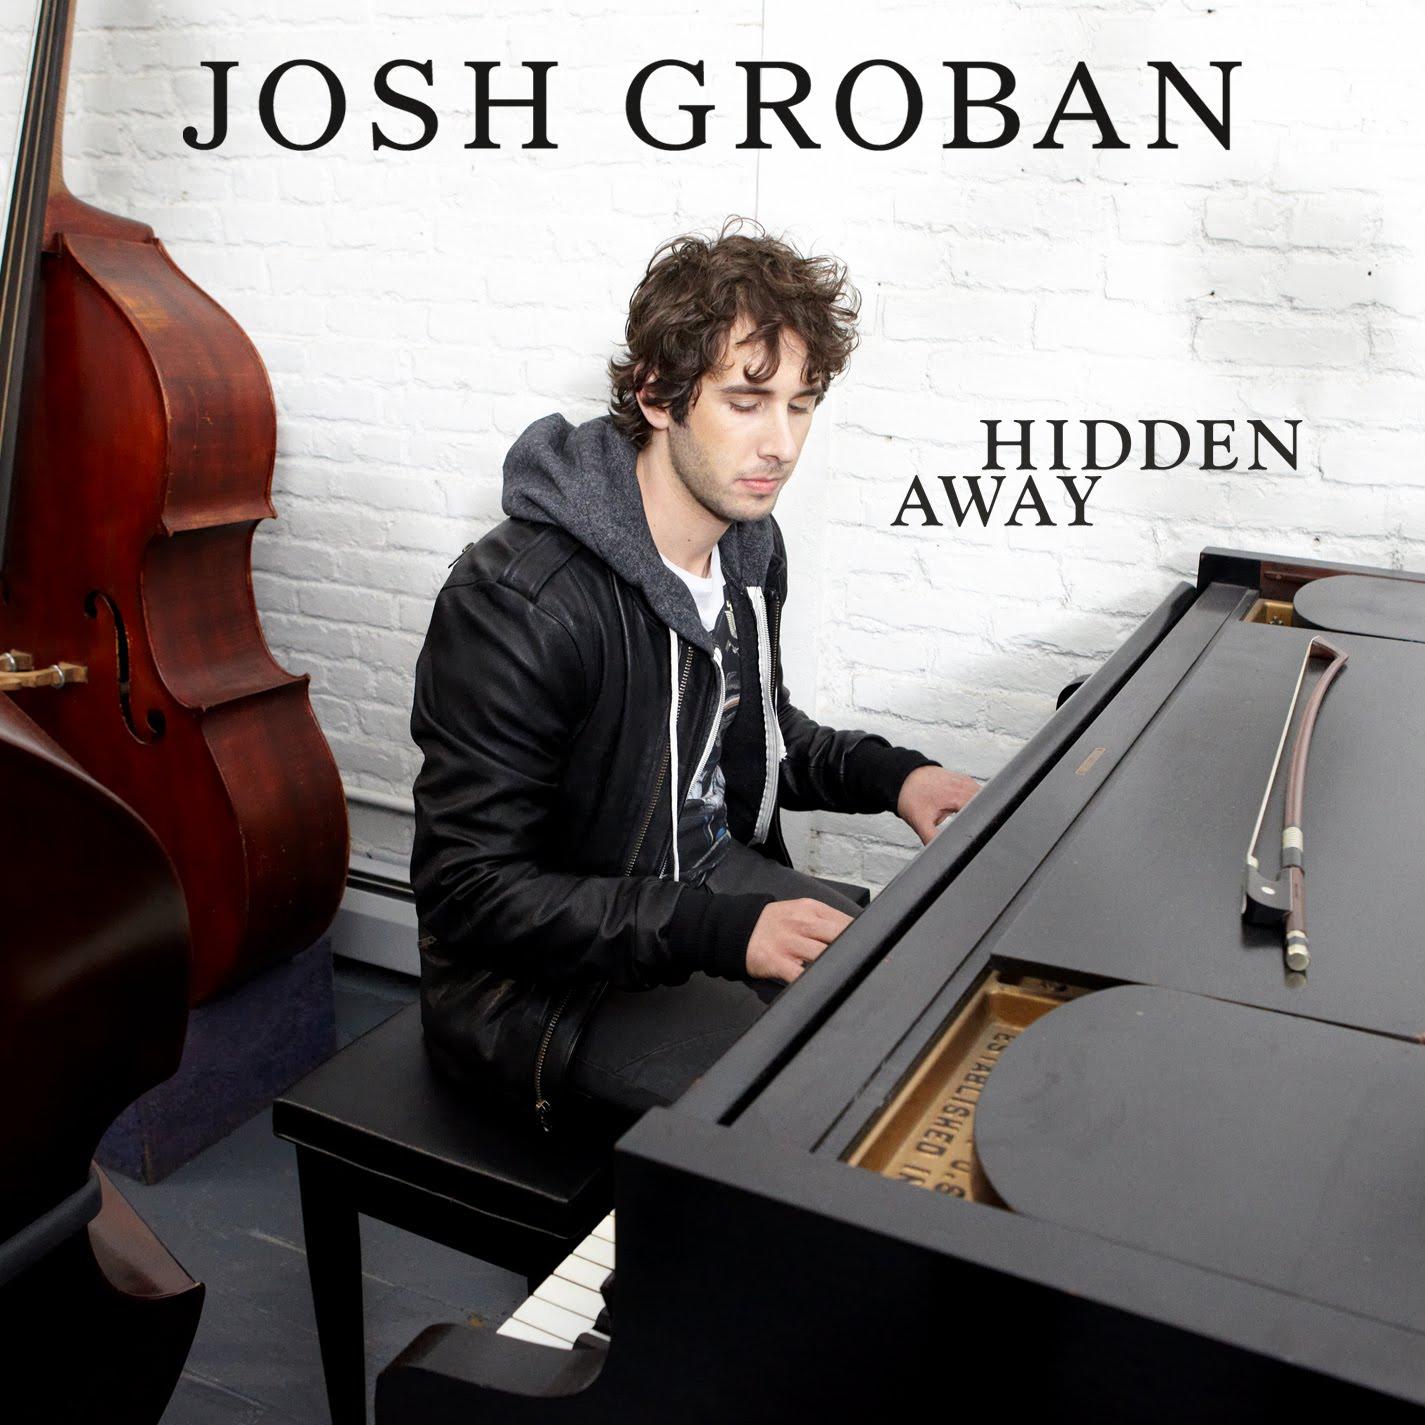 Songs on josh groban new album